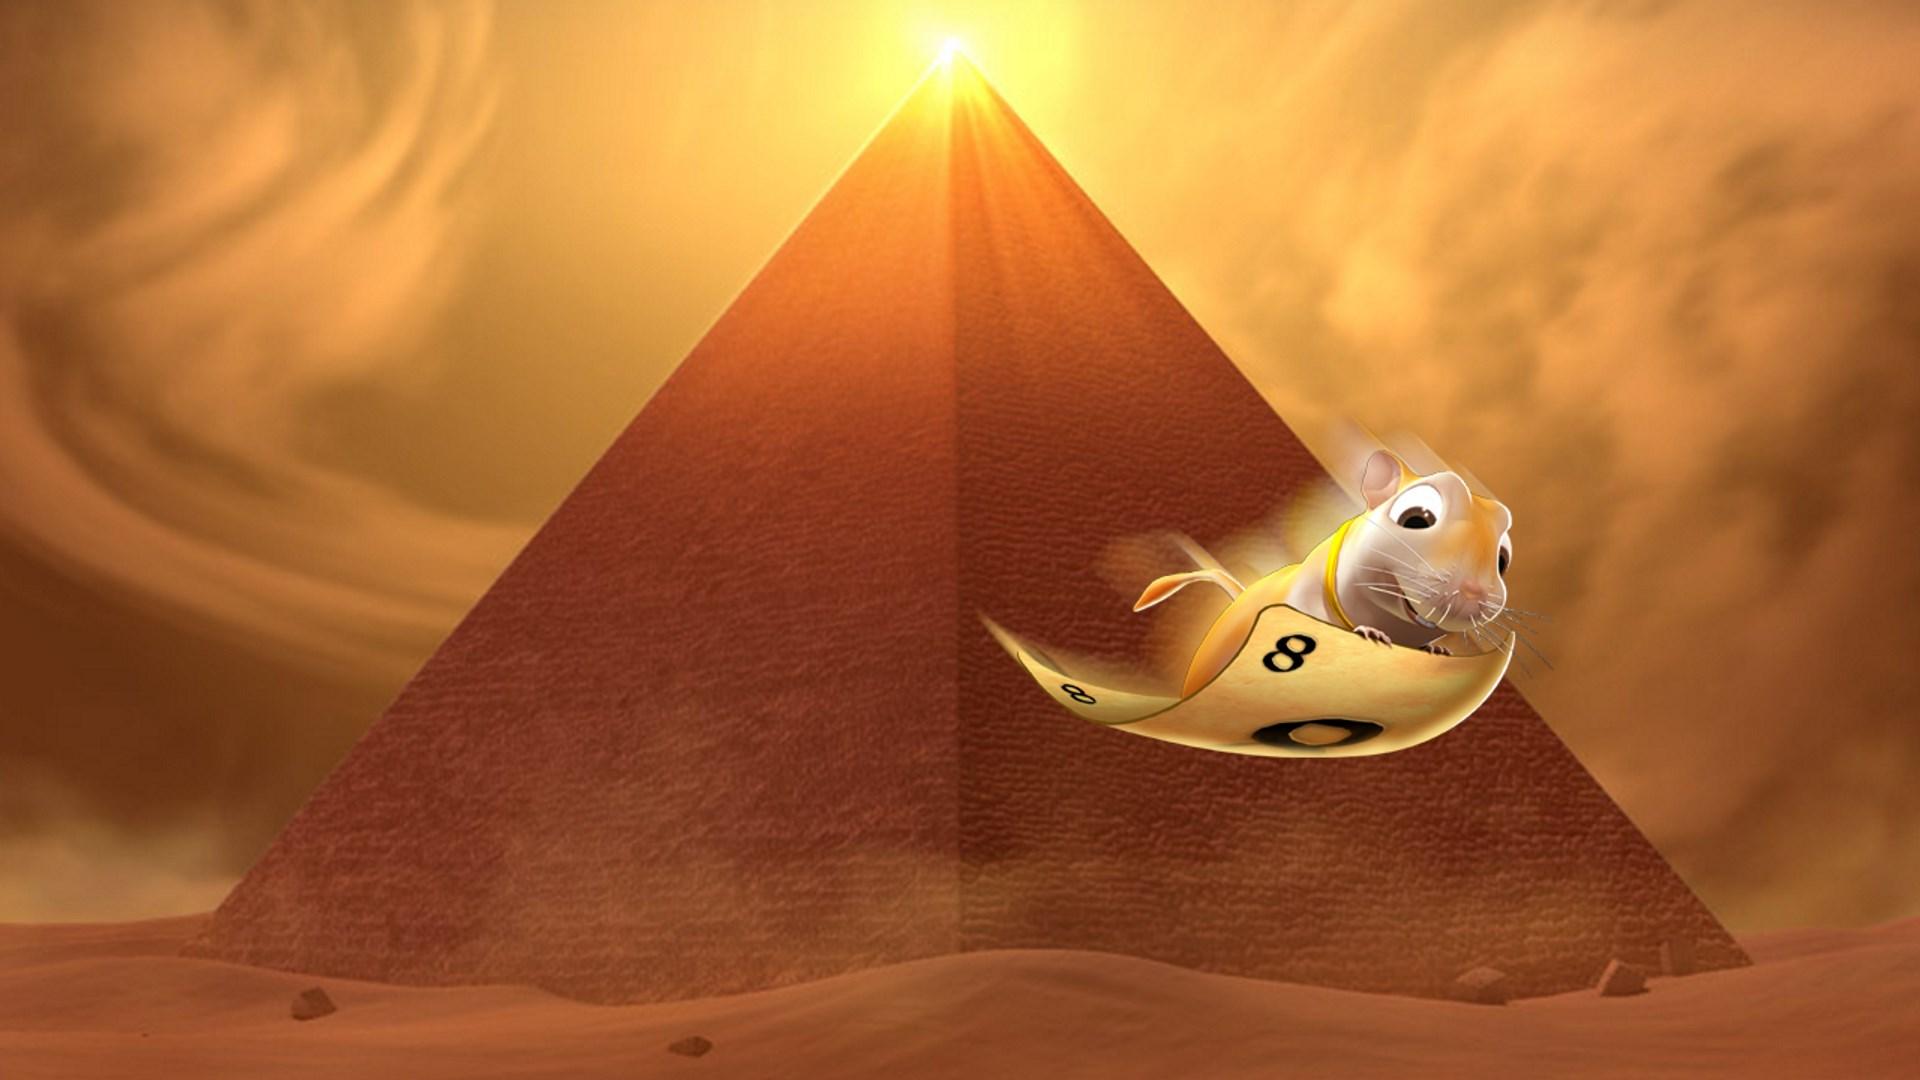 Get Pyramid Solitaire Saga Microsoft Store